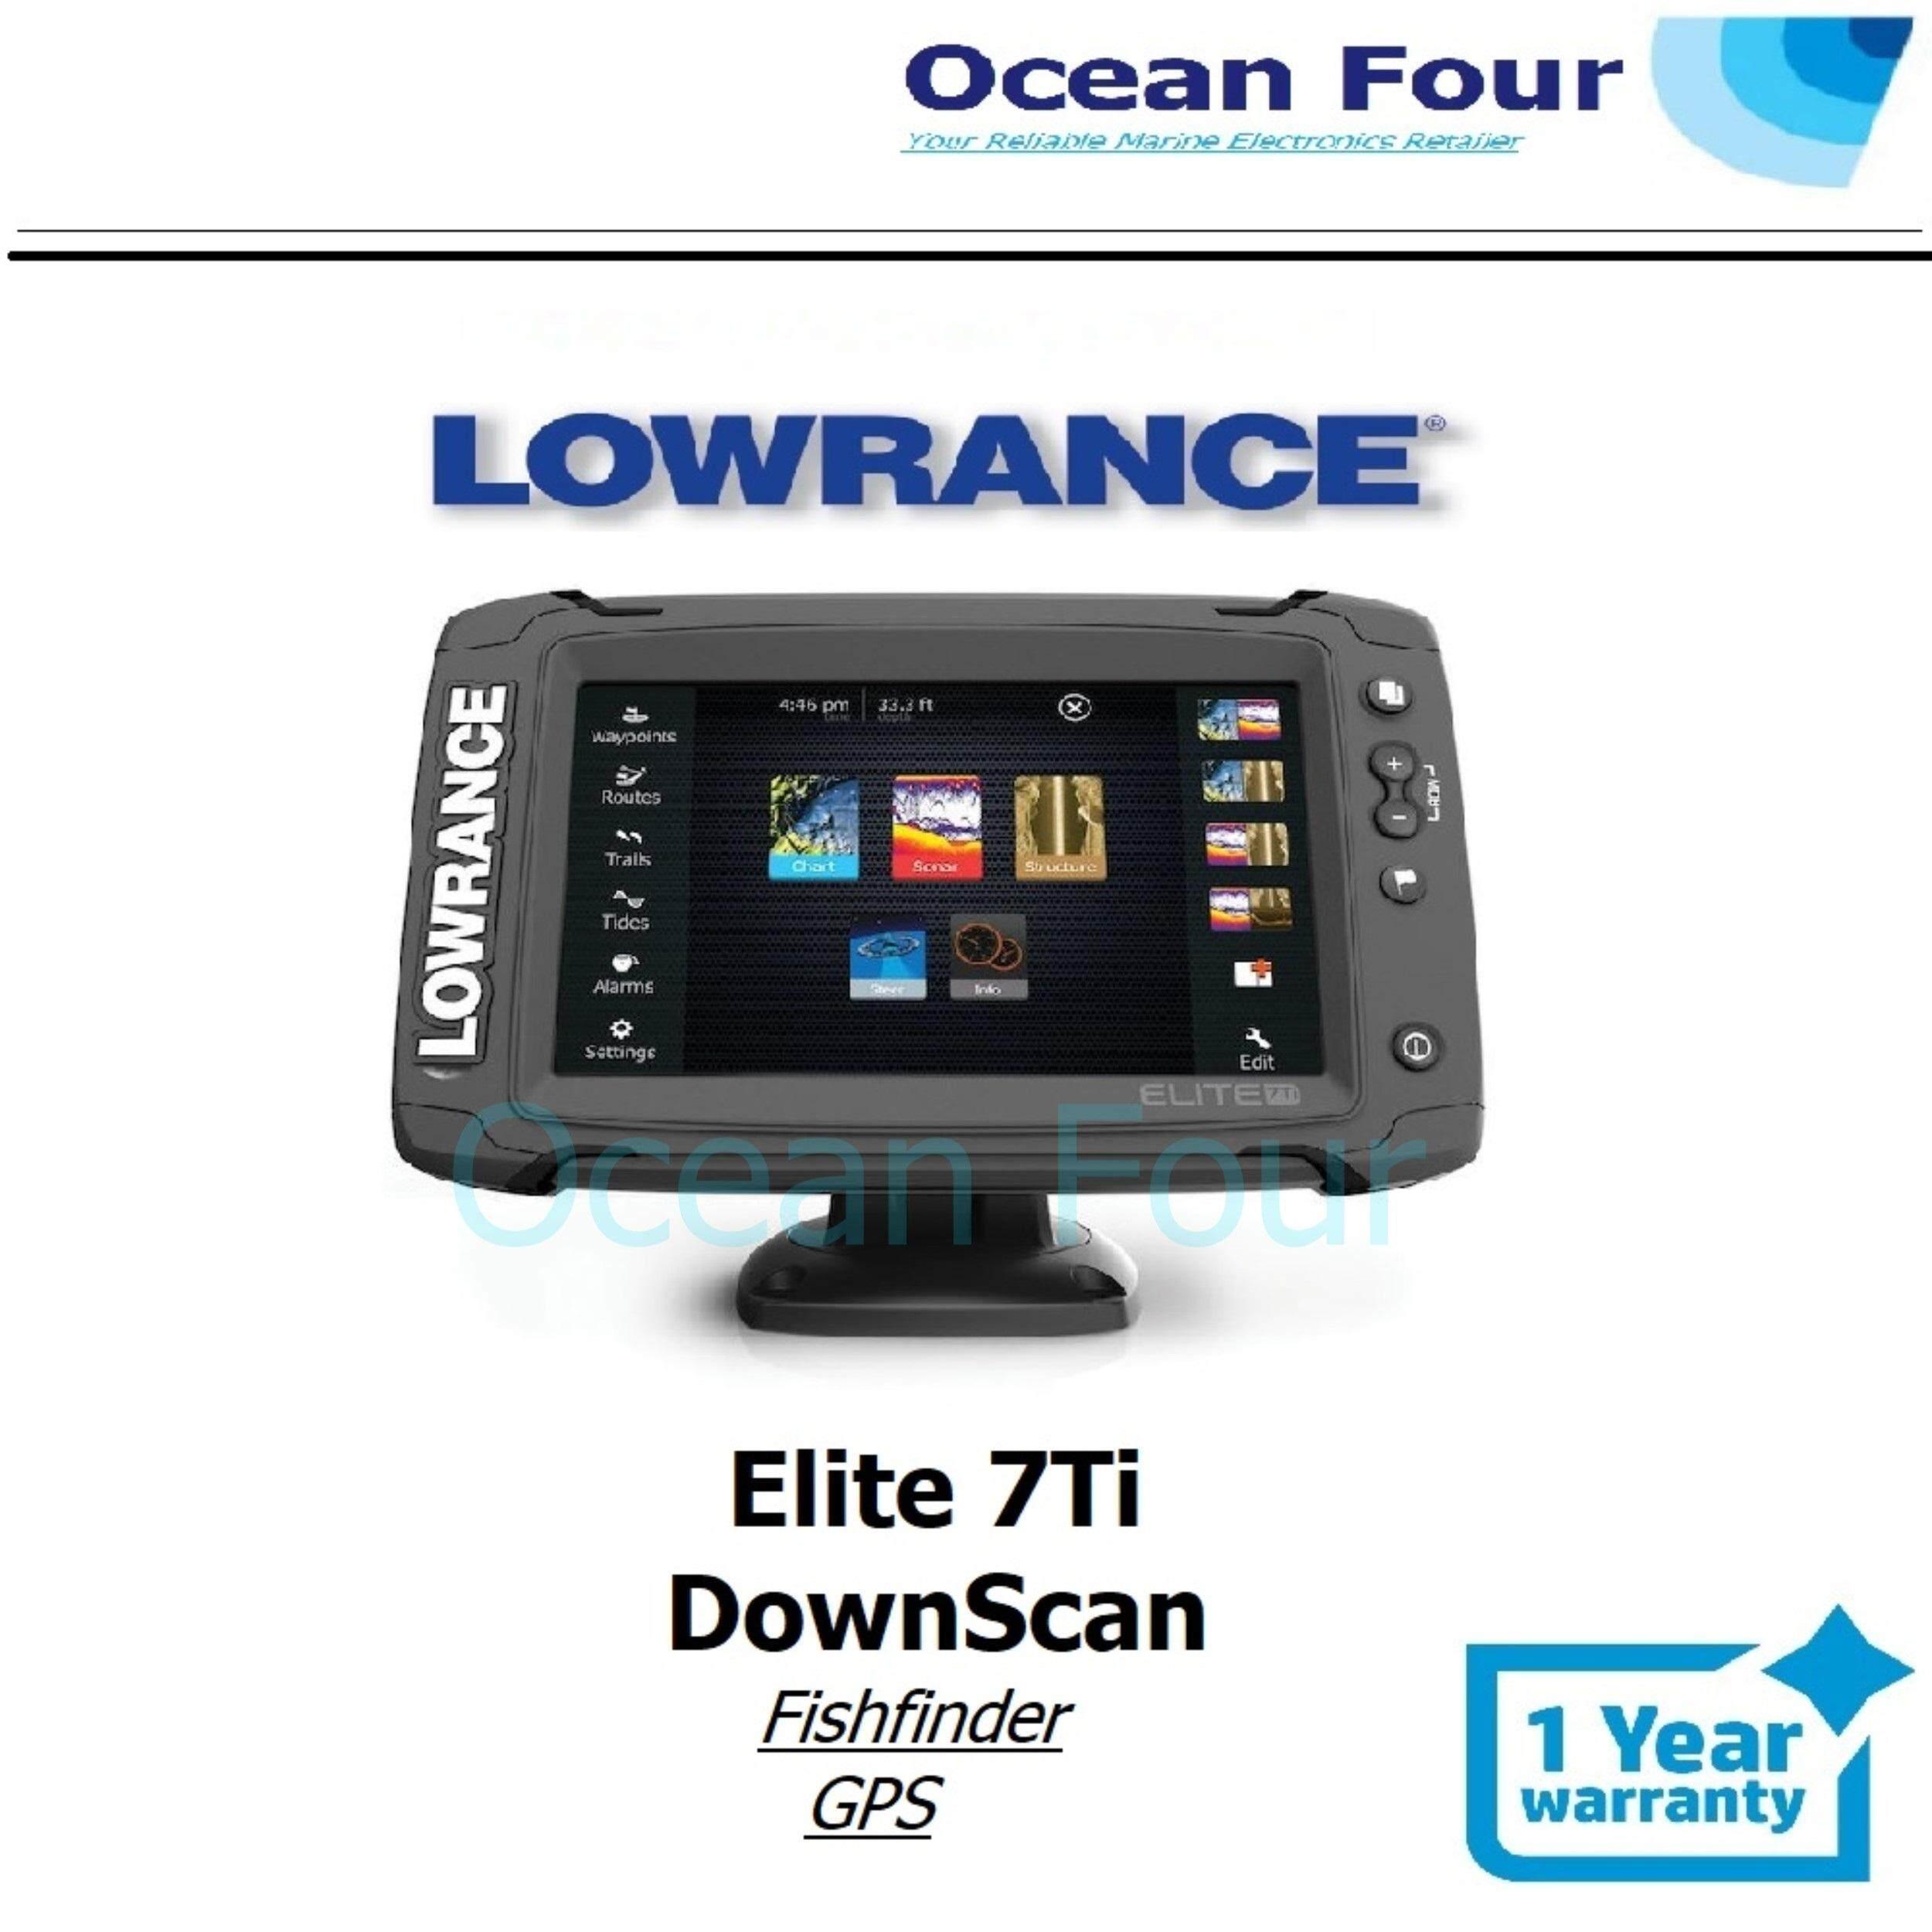 Lowrance Elite 7 Ti + DownScan Fishfinder GPS ( Cmap )